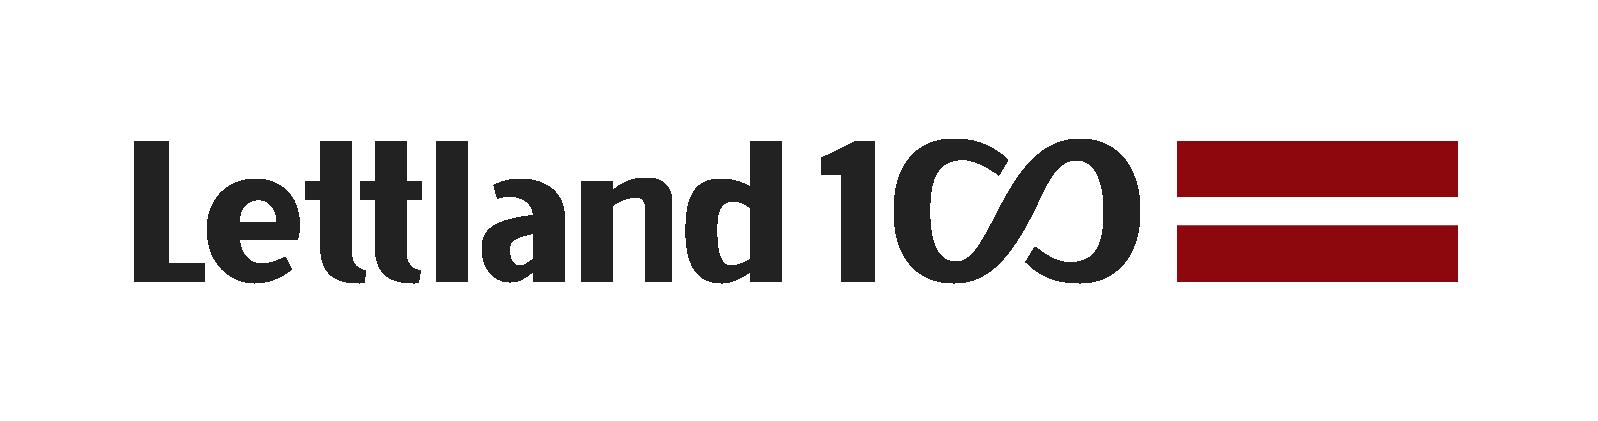 Lettland 100